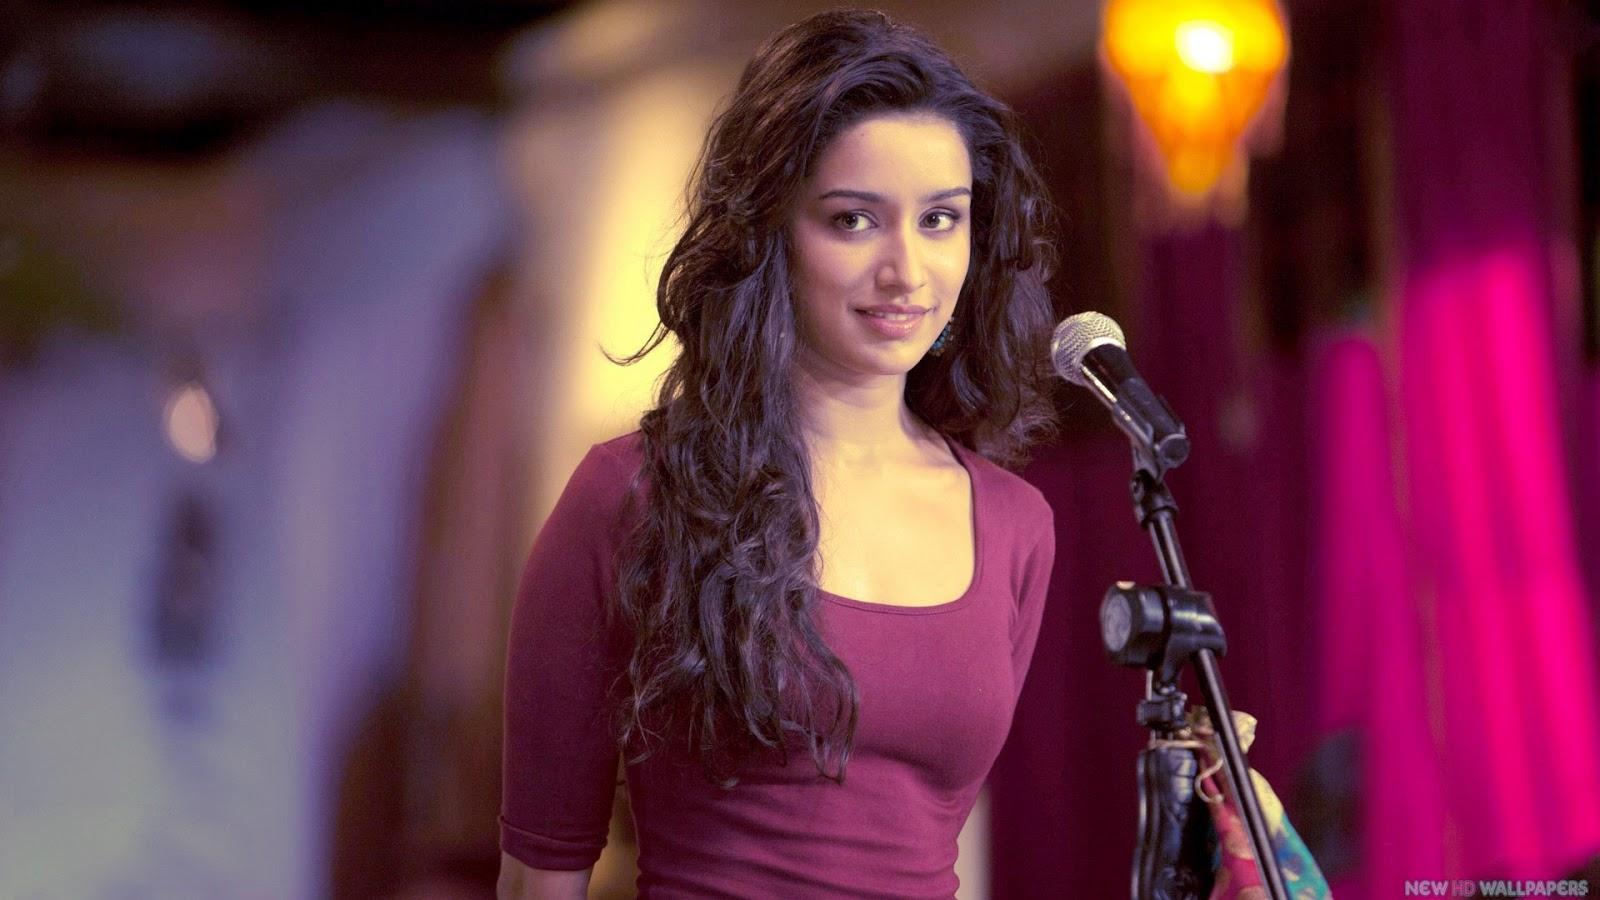 http://4.bp.blogspot.com/-Jp8UaSSBRno/UYPPhKipJtI/AAAAAAAAAH8/4Ncl2q0fuhQ/s1600/Shraddha-Kapoor-in-Movie-Aashiqui-2.jpg